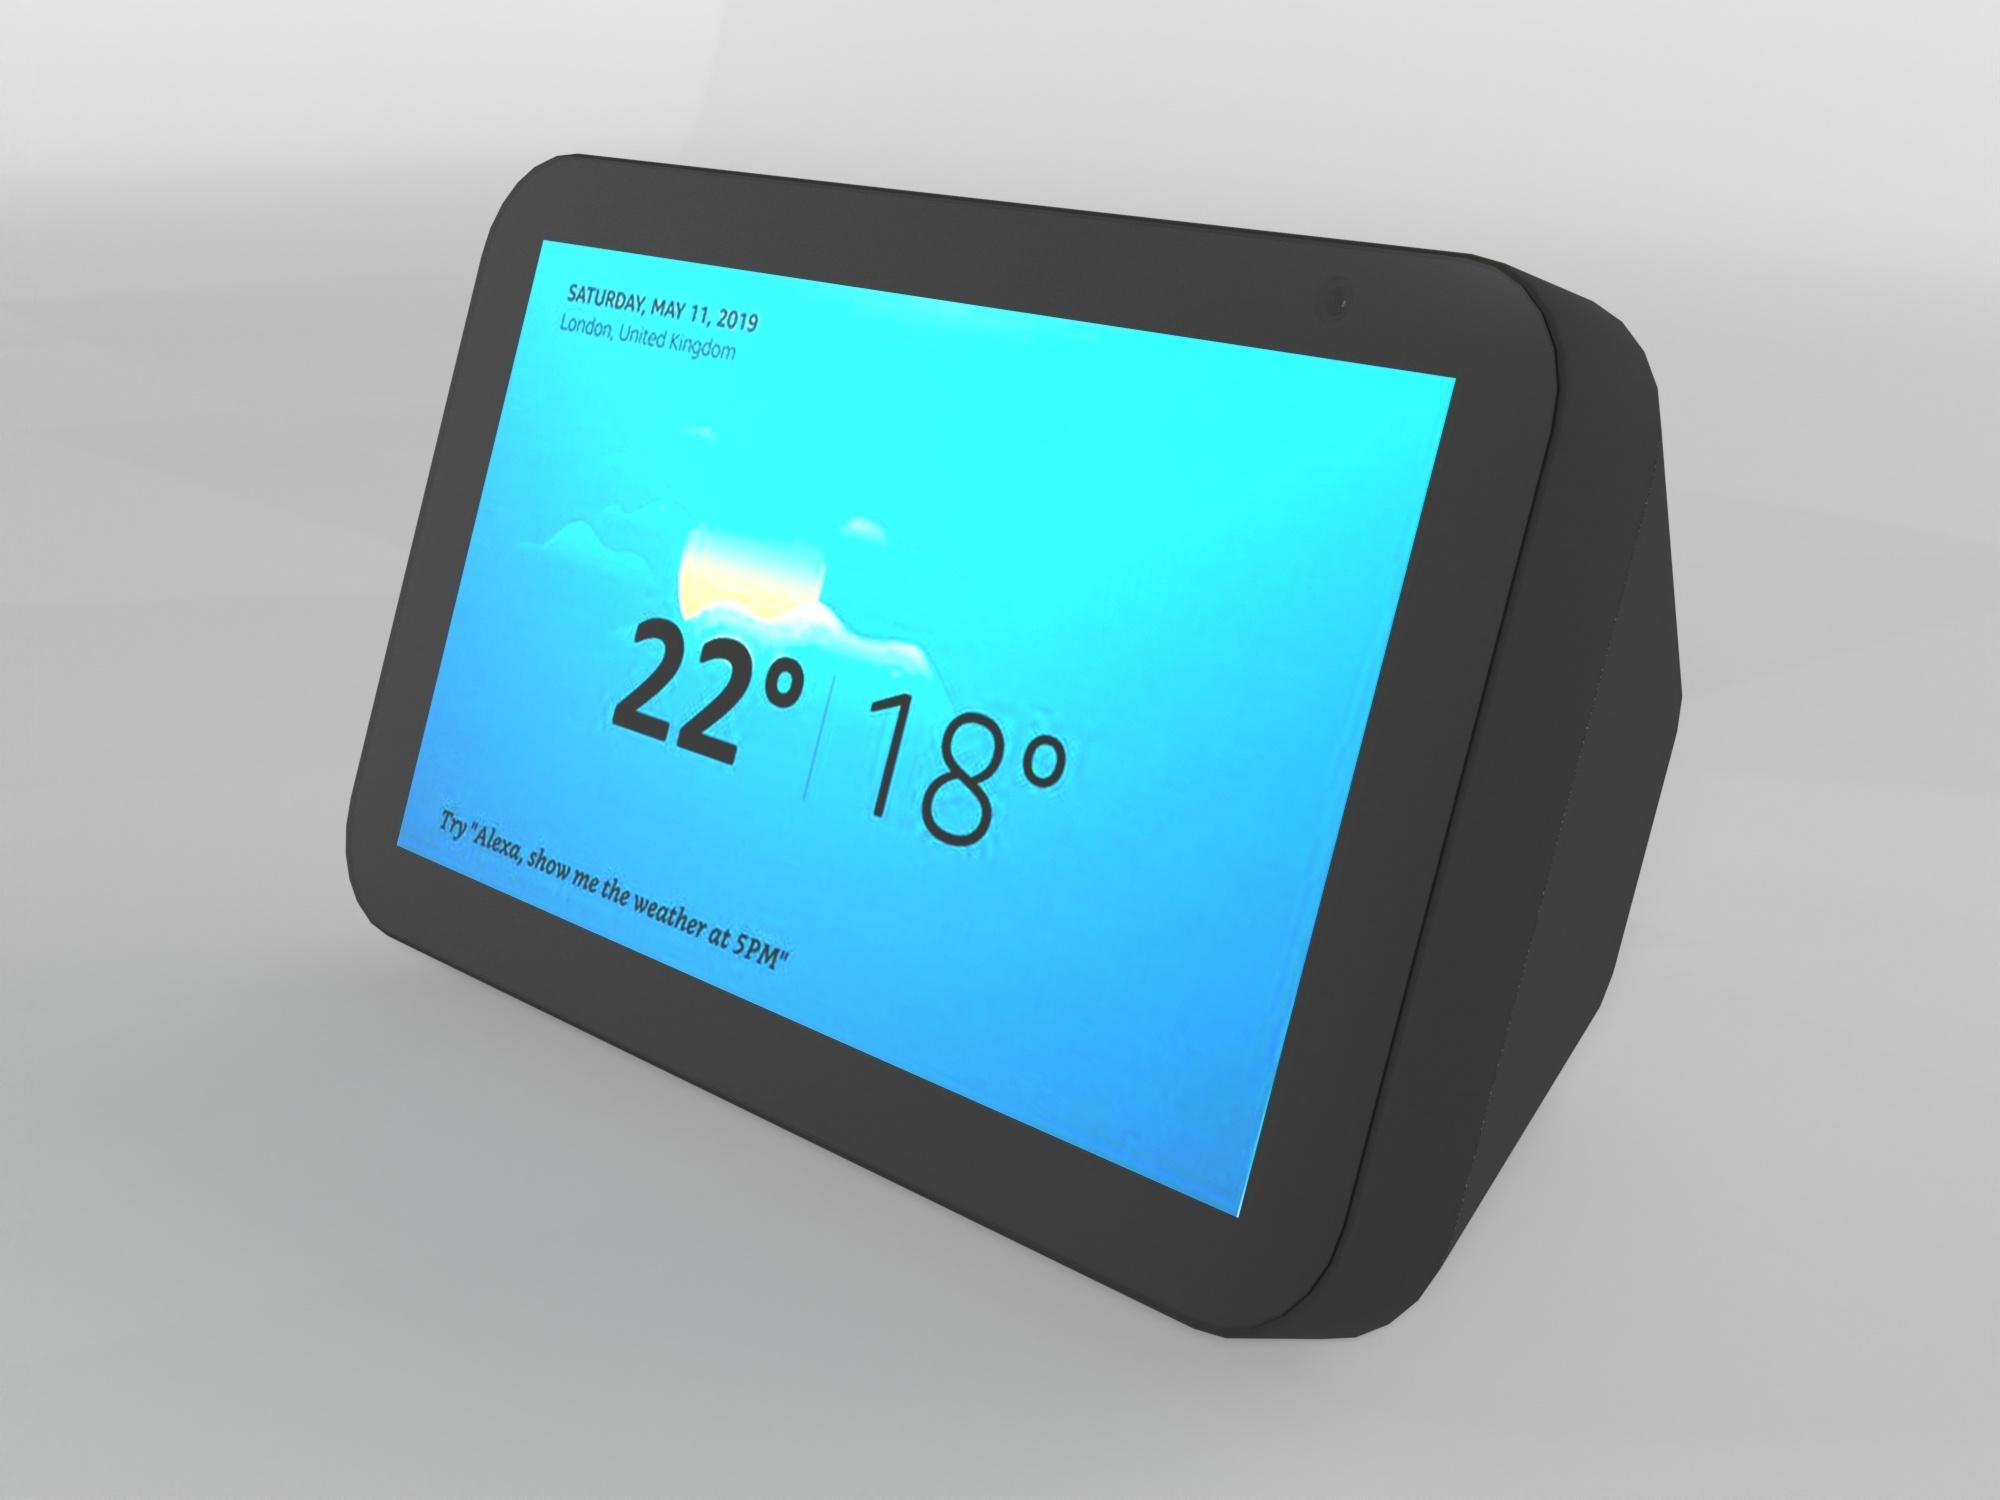 Amazon Echo 5 3d Model Turbosquid 1463183